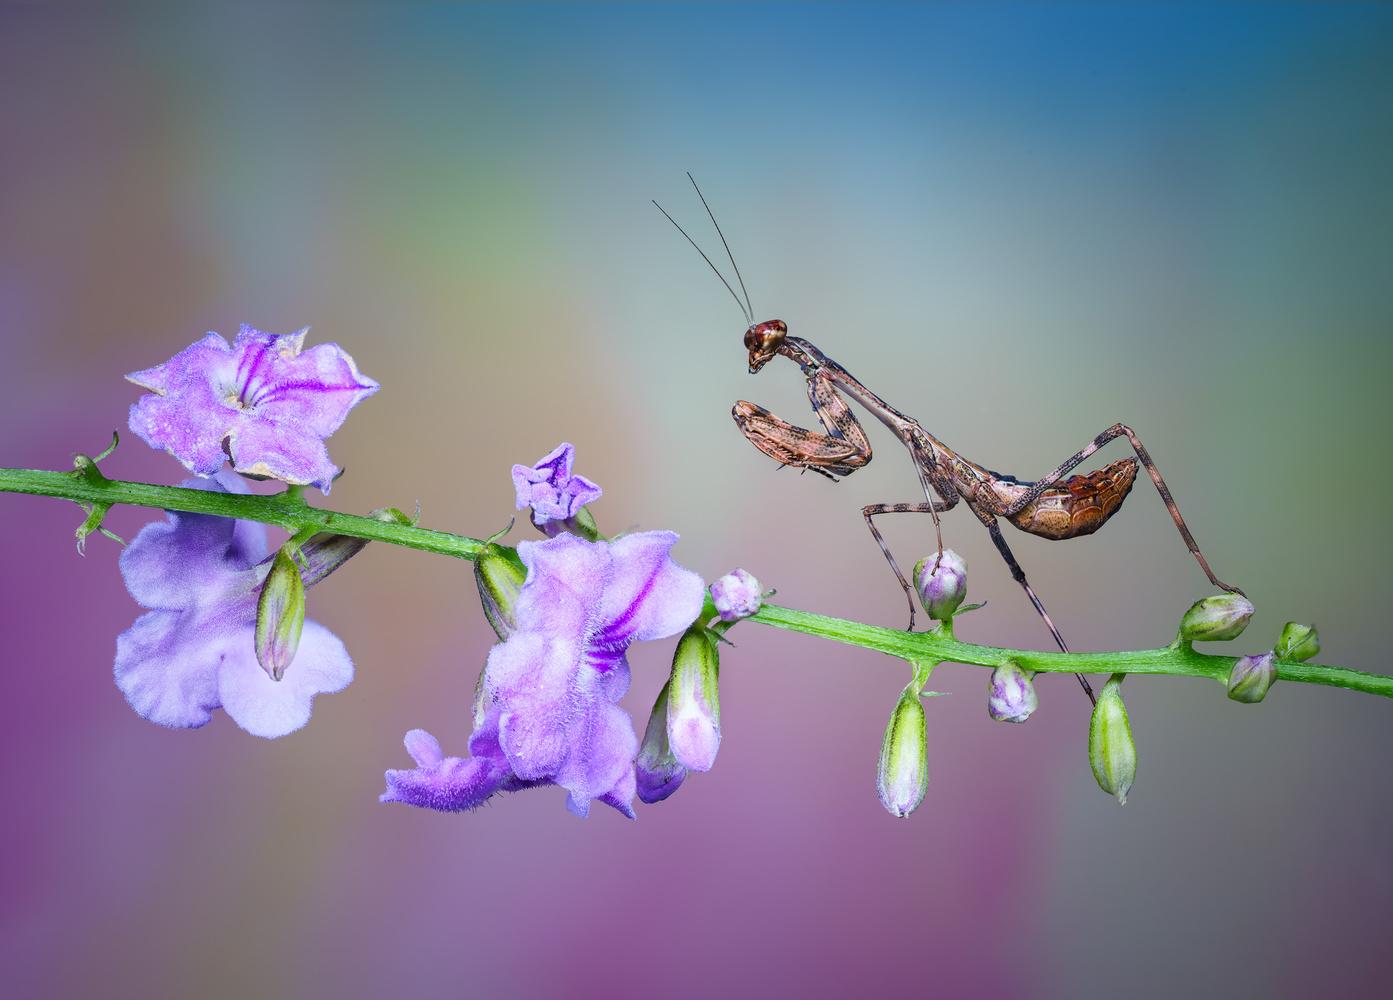 Lilac Mantis Dream by Liza Rock